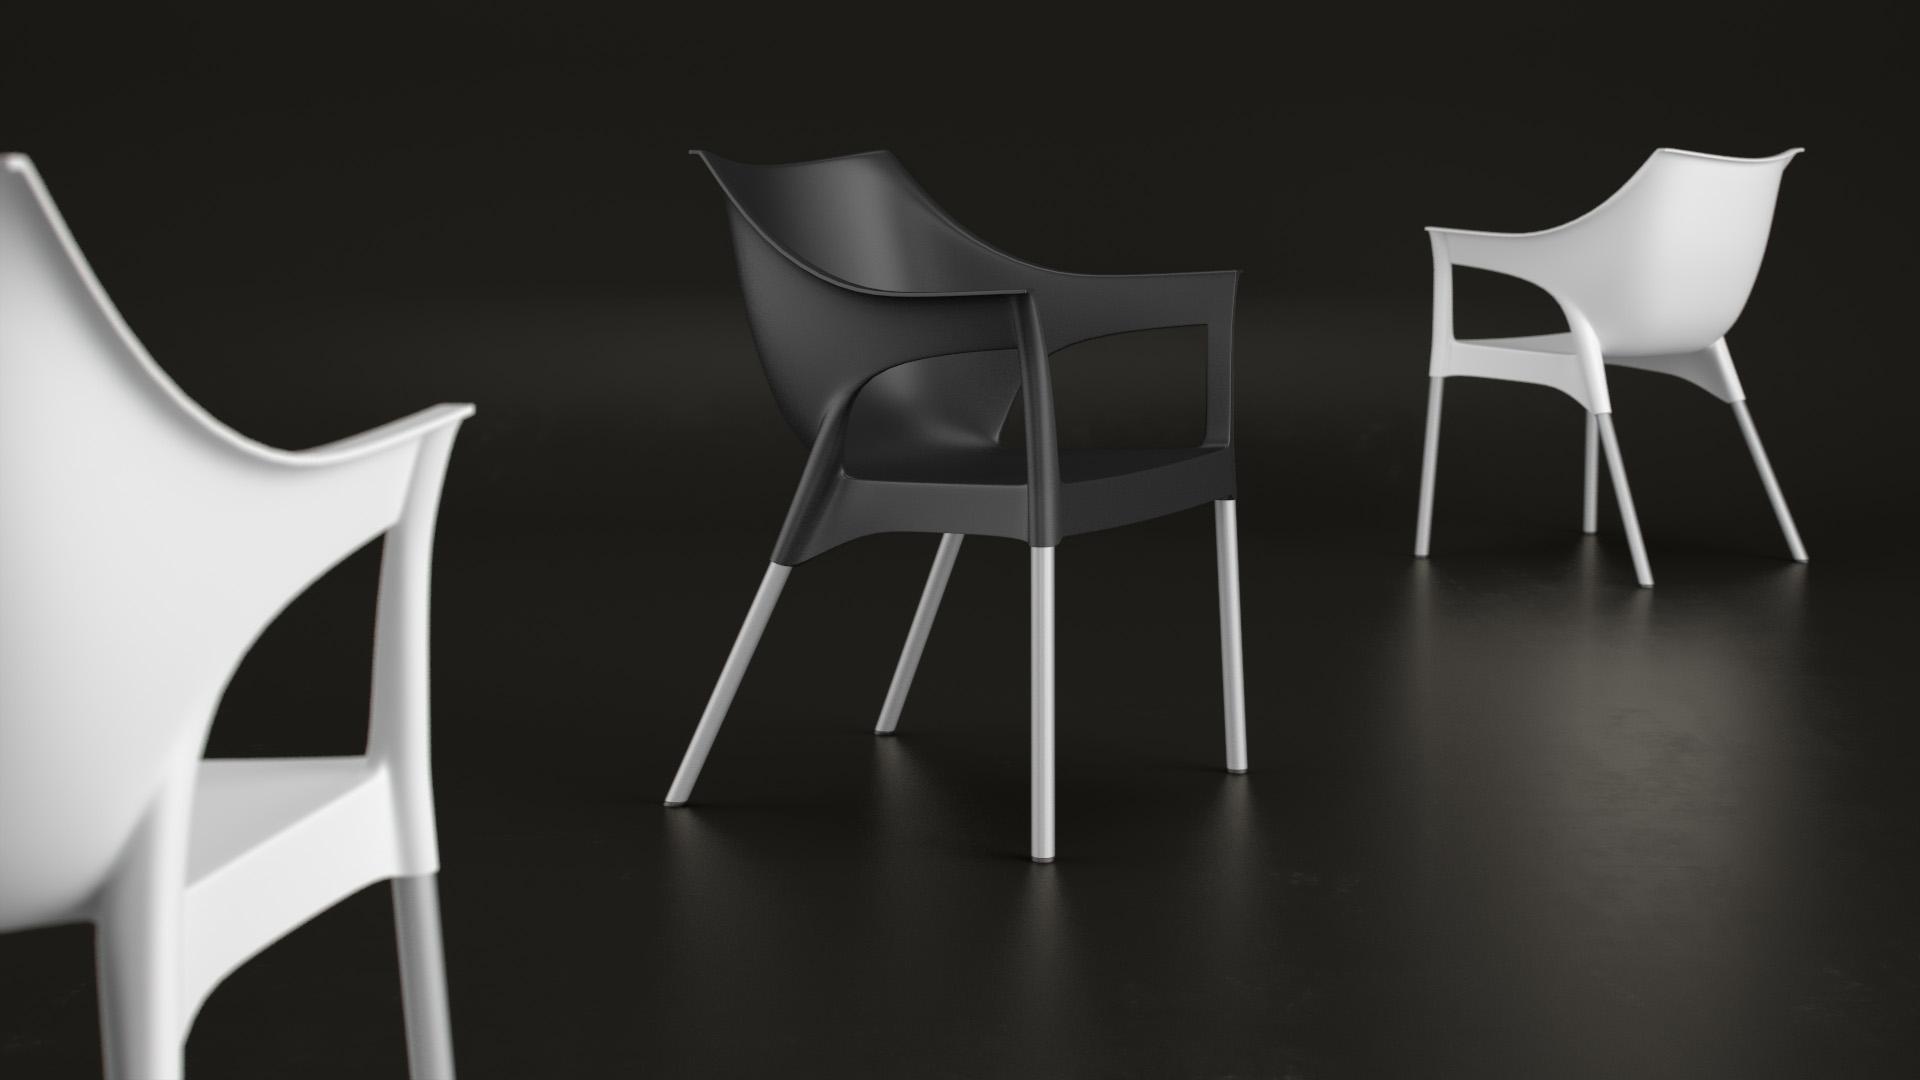 Pole_Chair_BlackSet_01_V1.01_0005